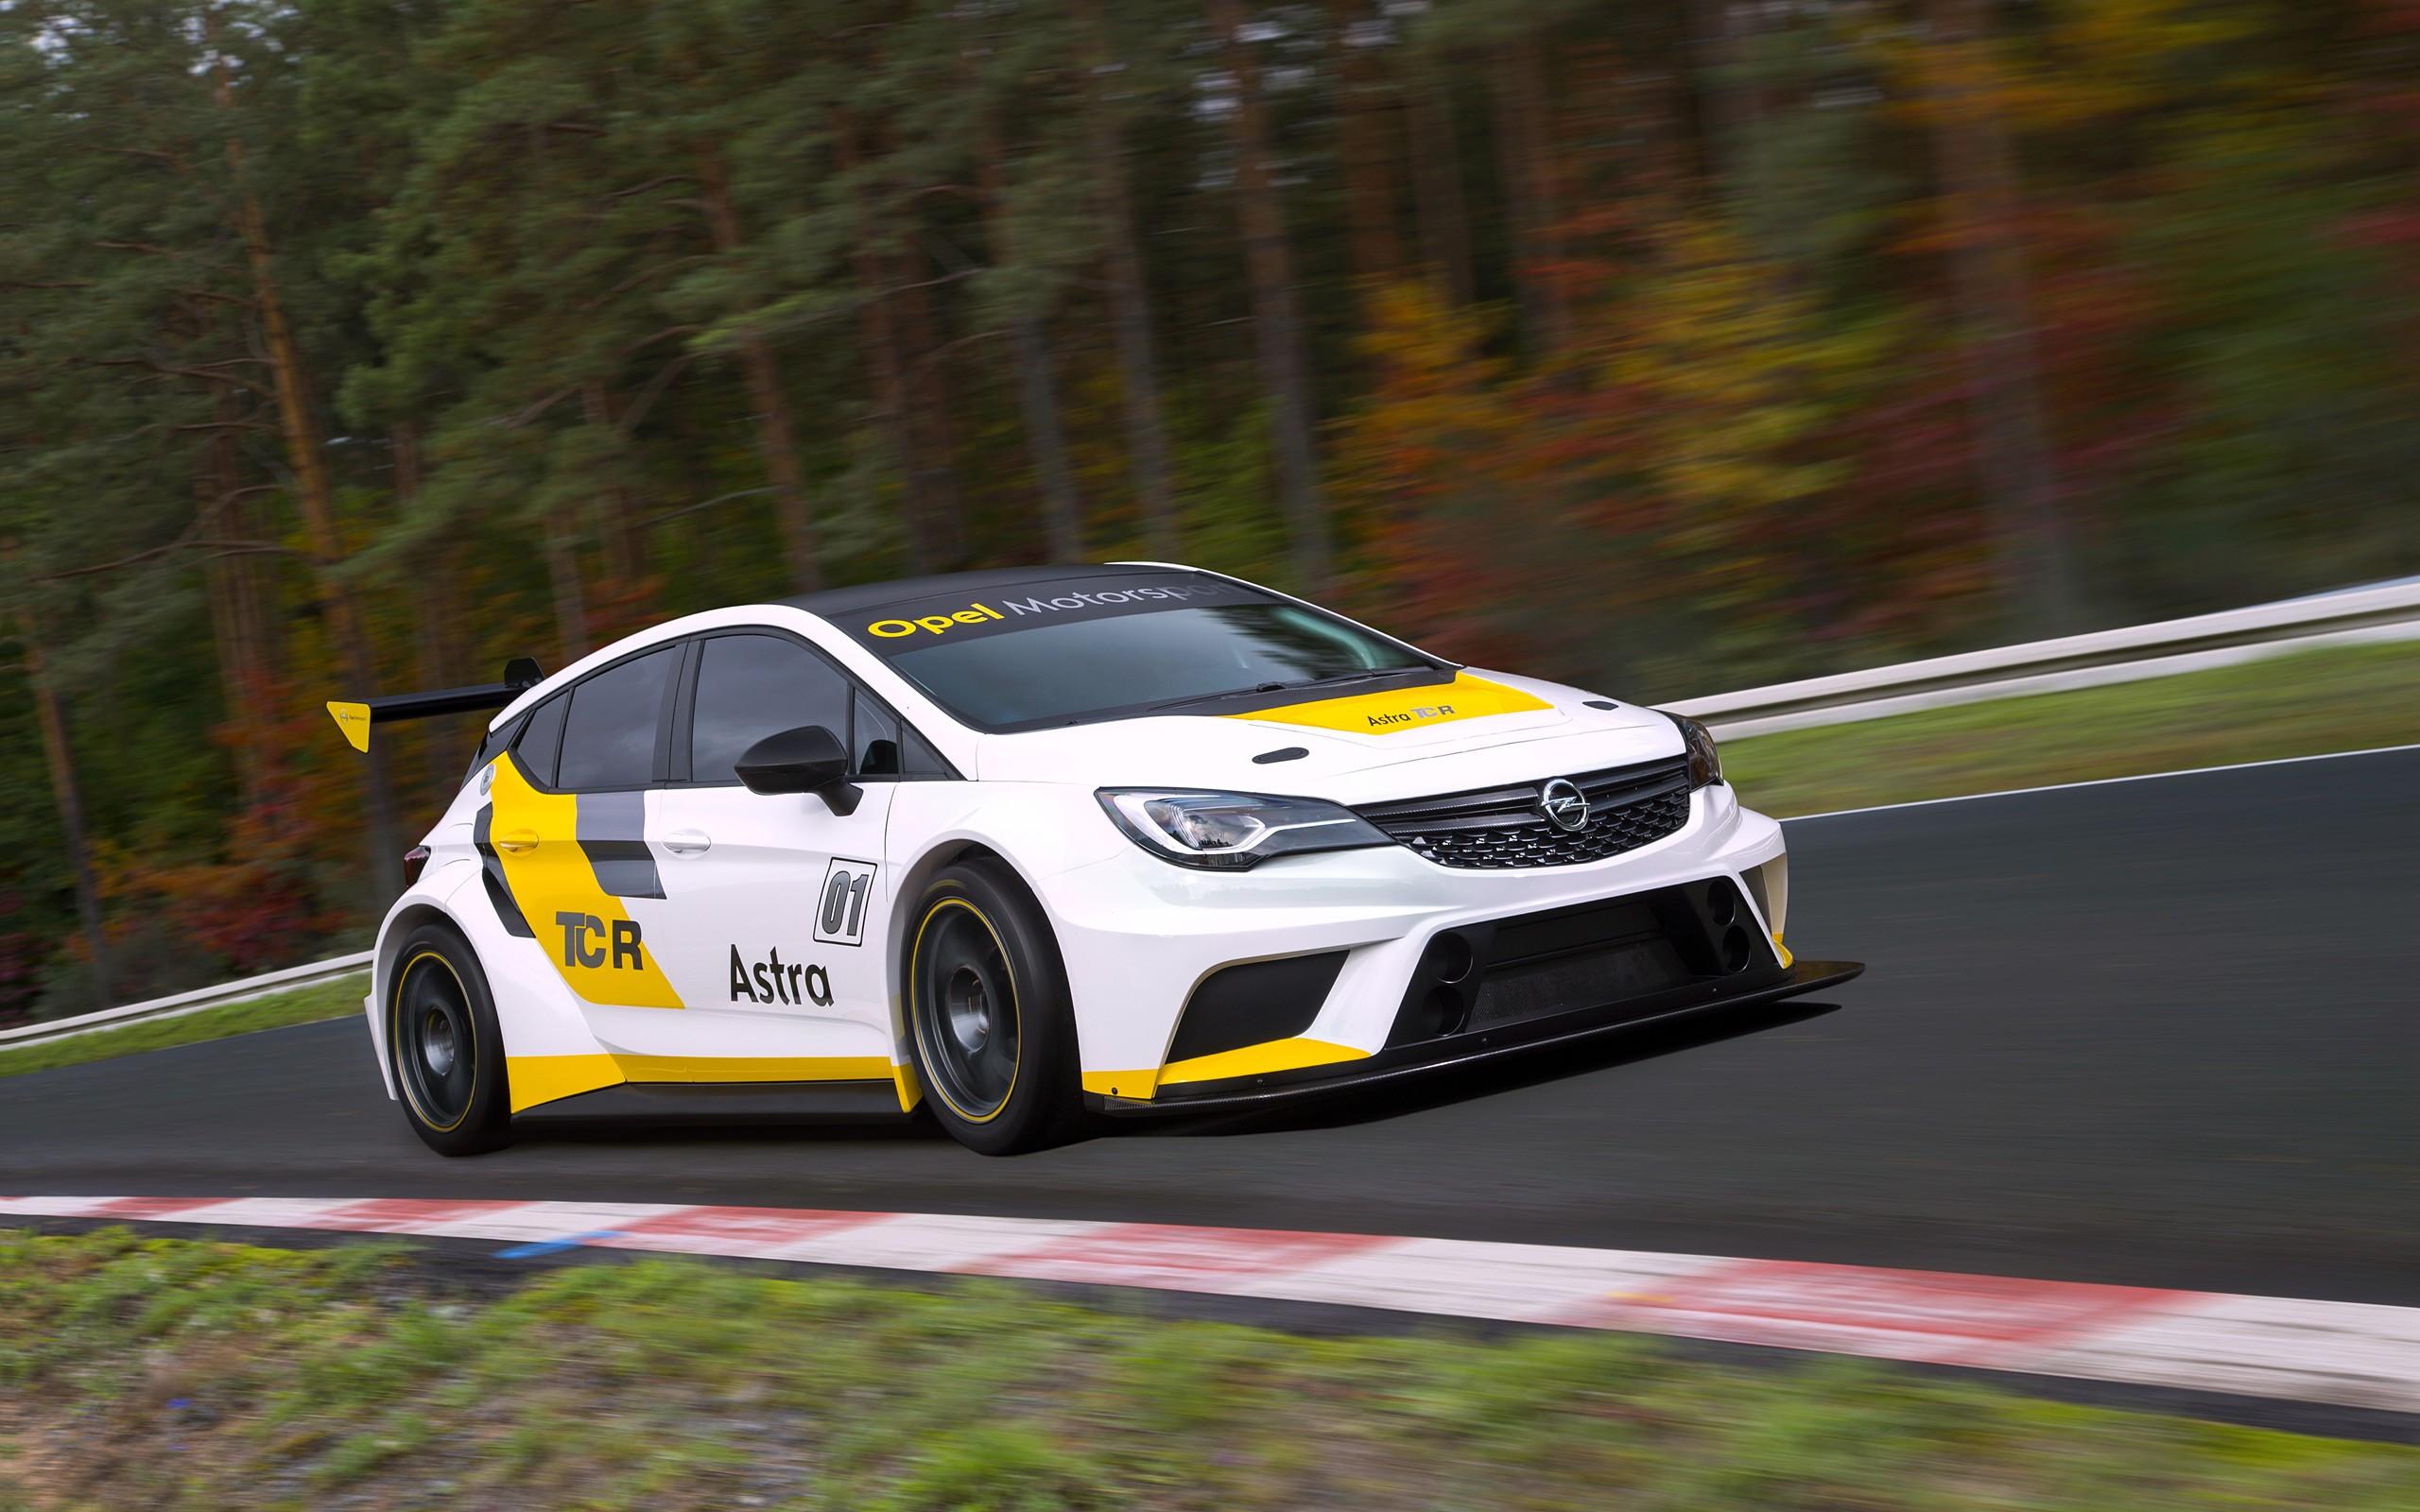 General 2560x1600 car race tracks motion blur